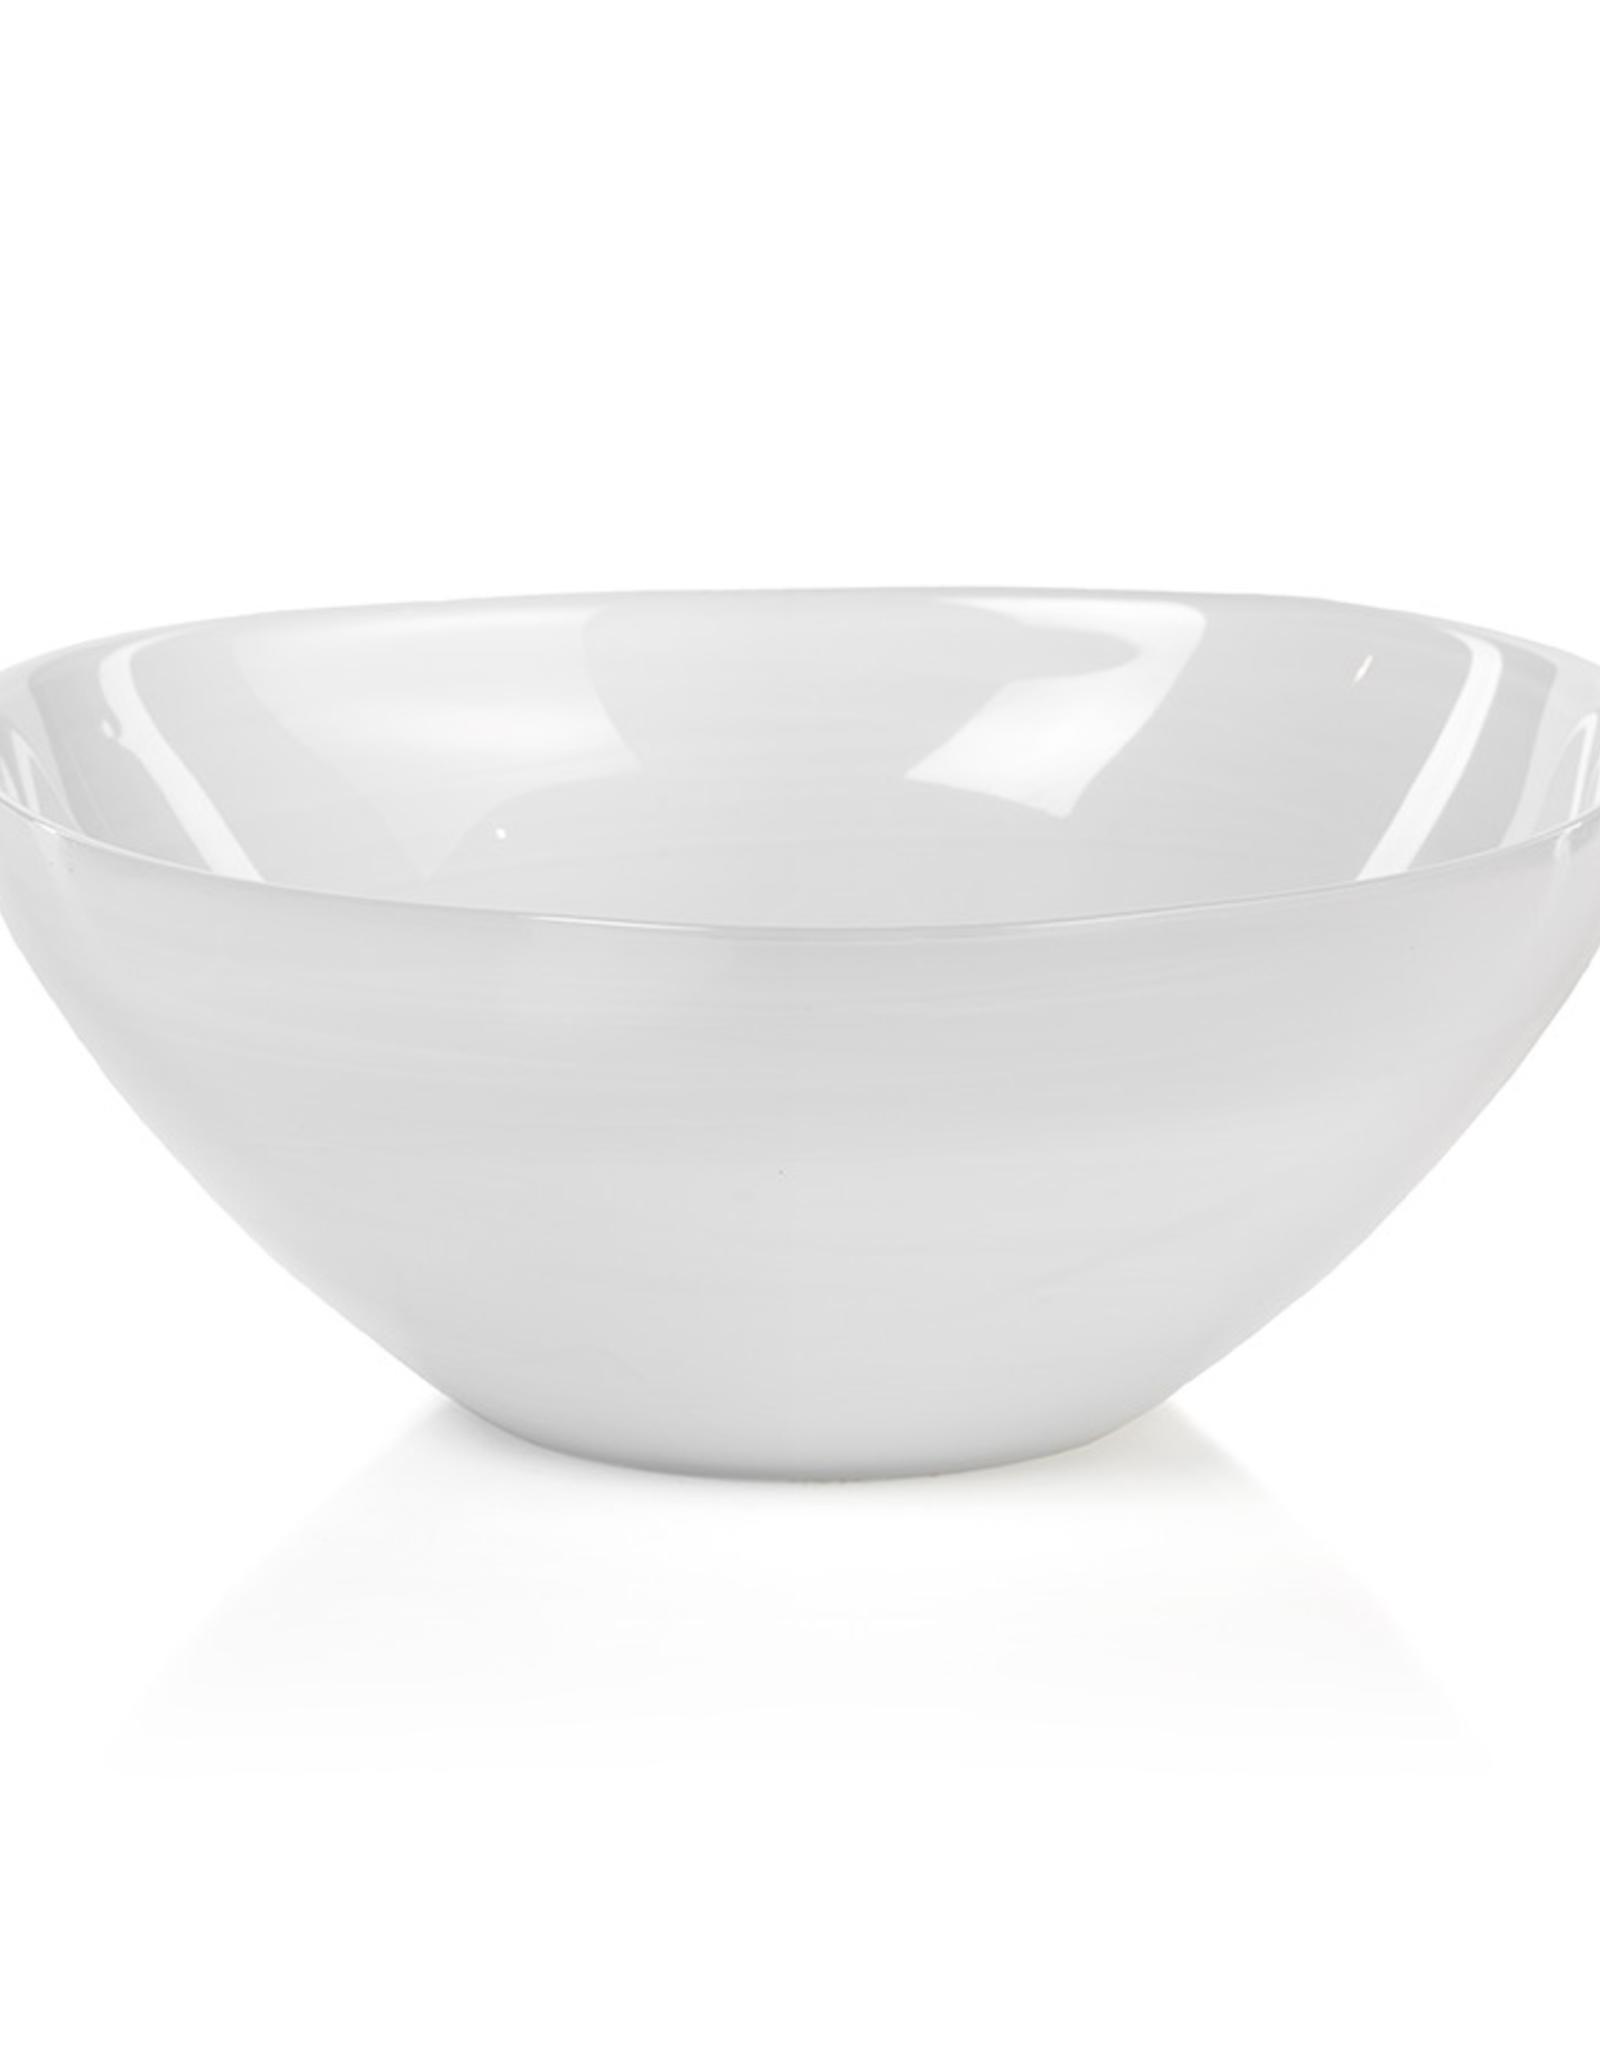 "Bowl, Monte Carlo, White Alabaster Glass, D 11.5"""